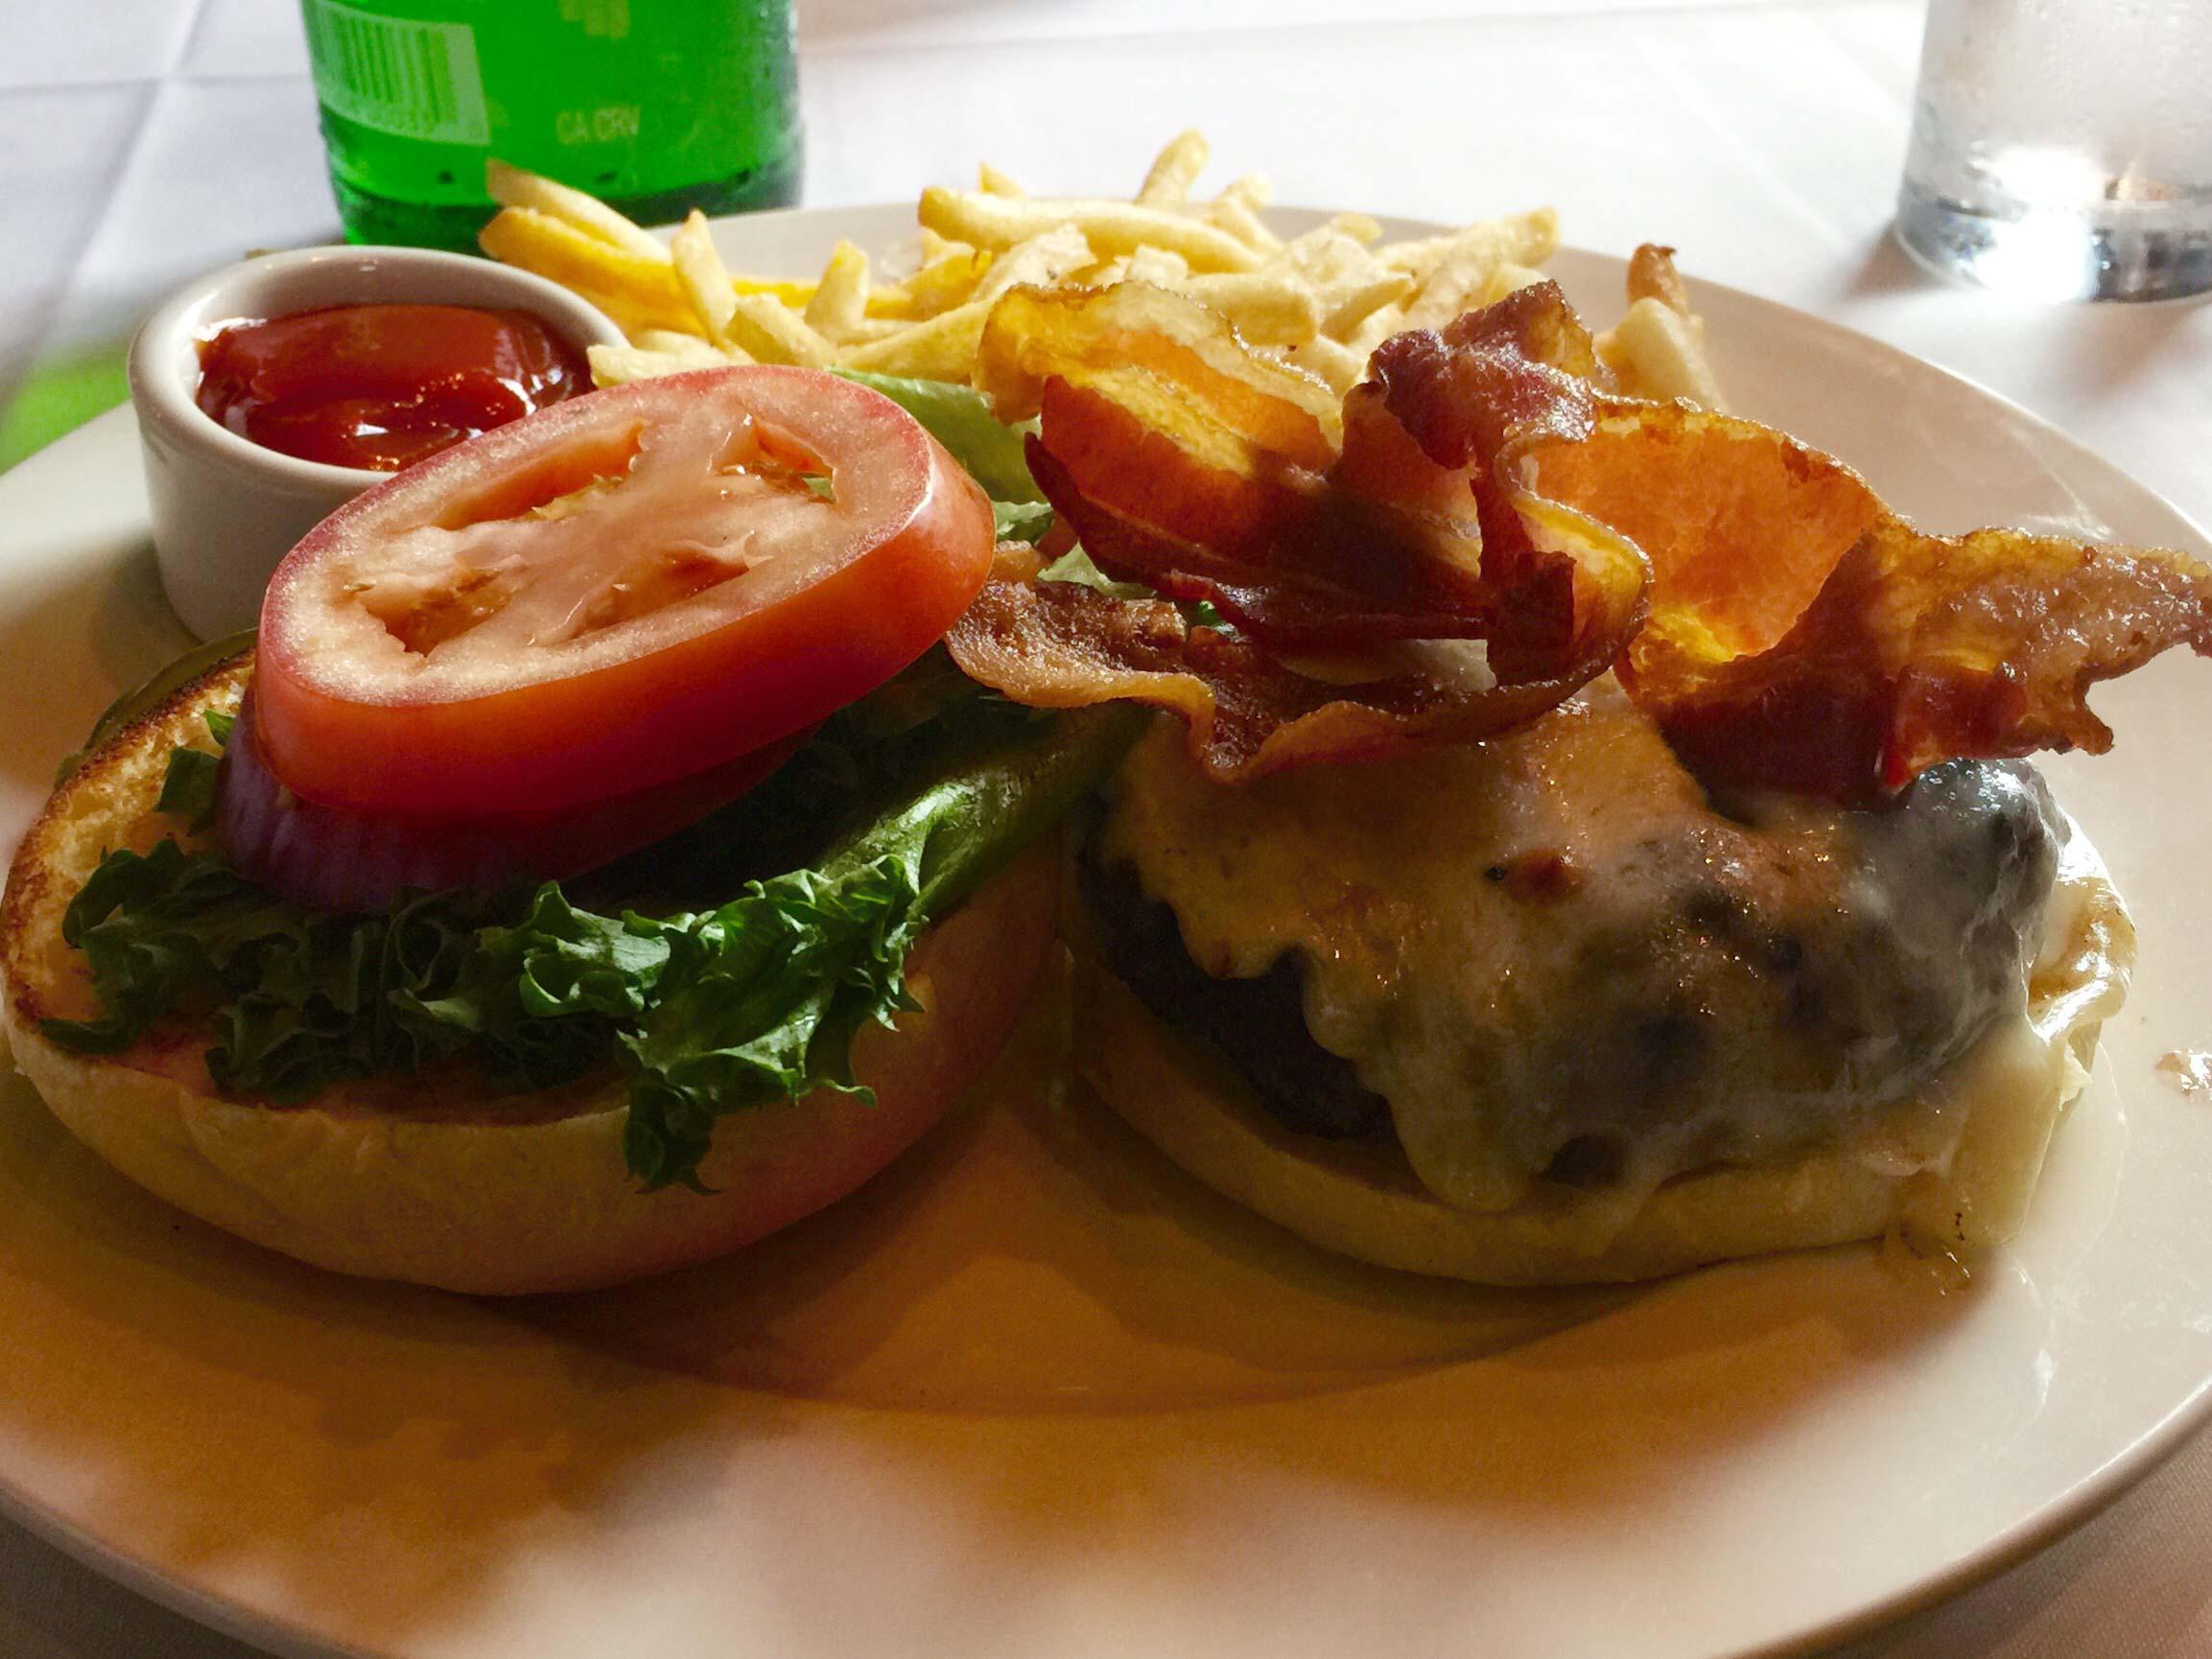 The Butcher Shop Burger from B&B Butchers & Restaurant